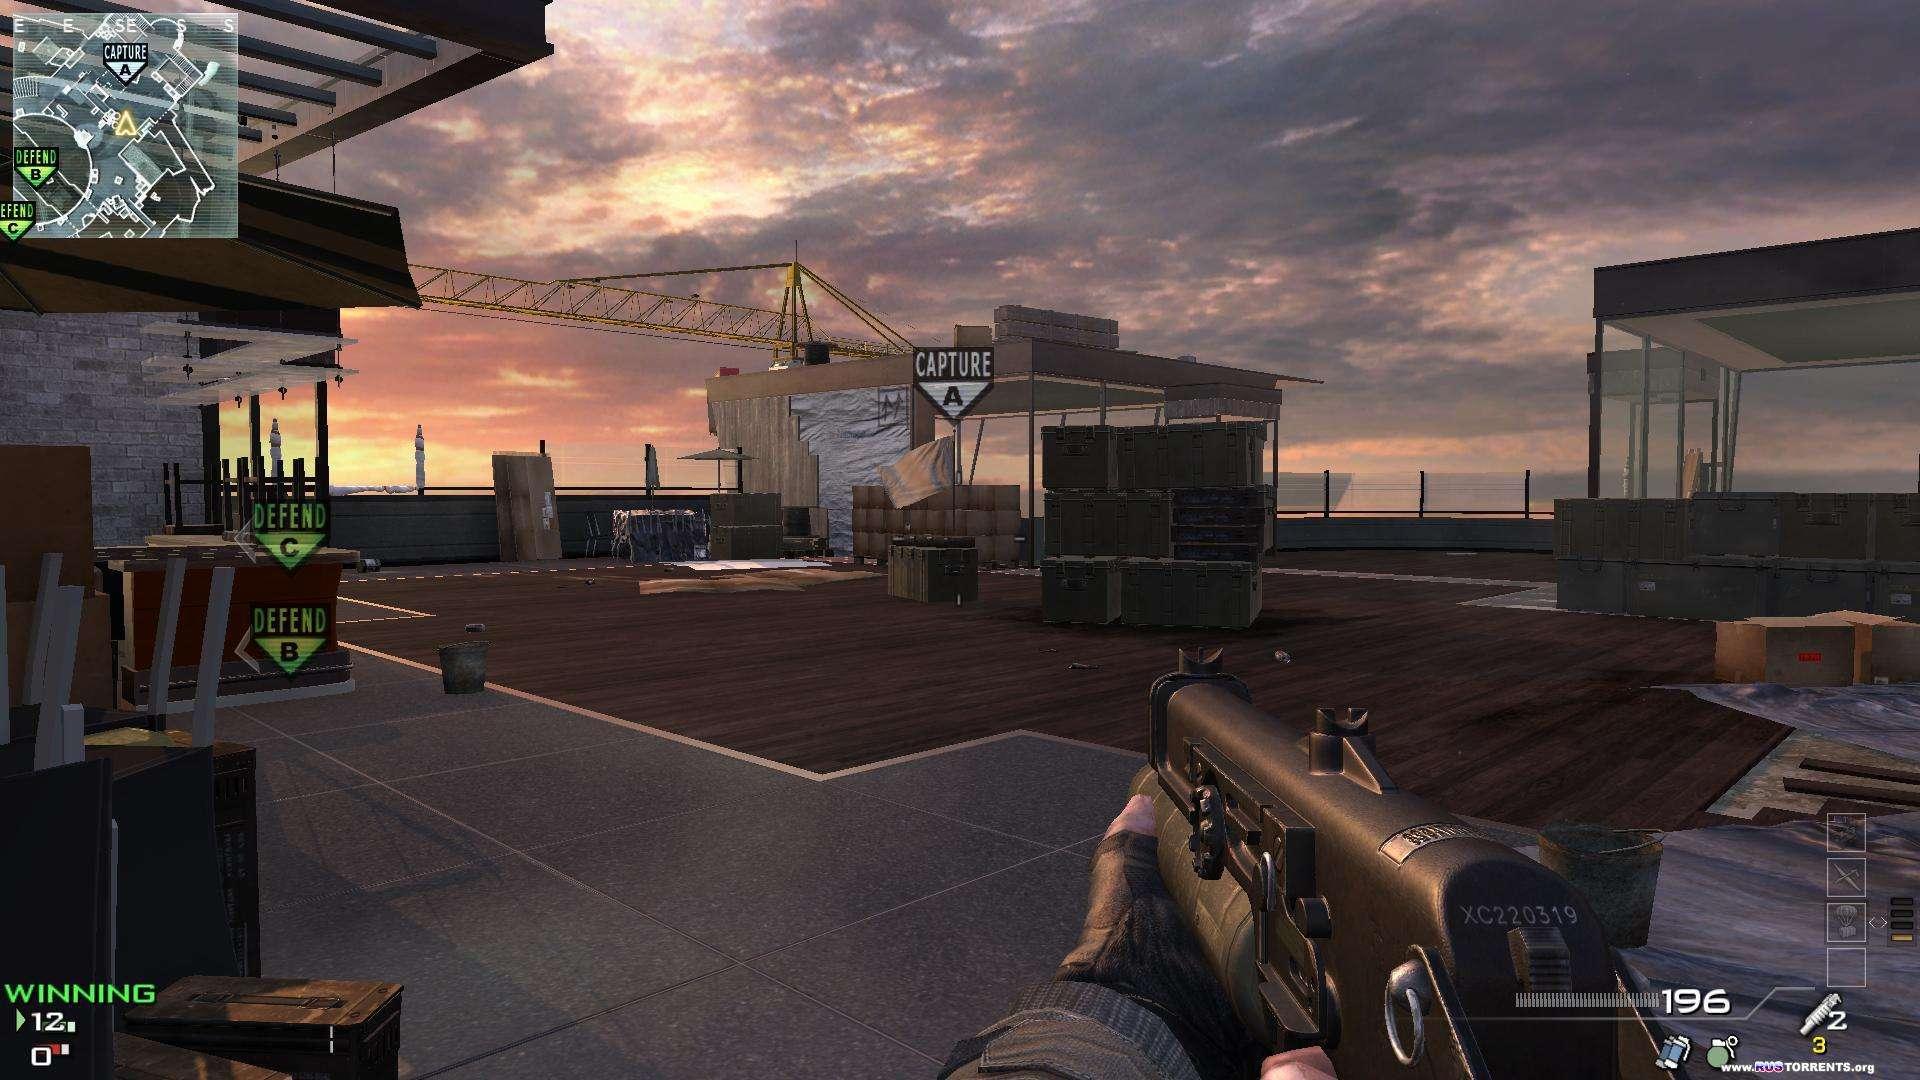 Call of Duty: Modern Warfare 3 [Multiplayer] | PC